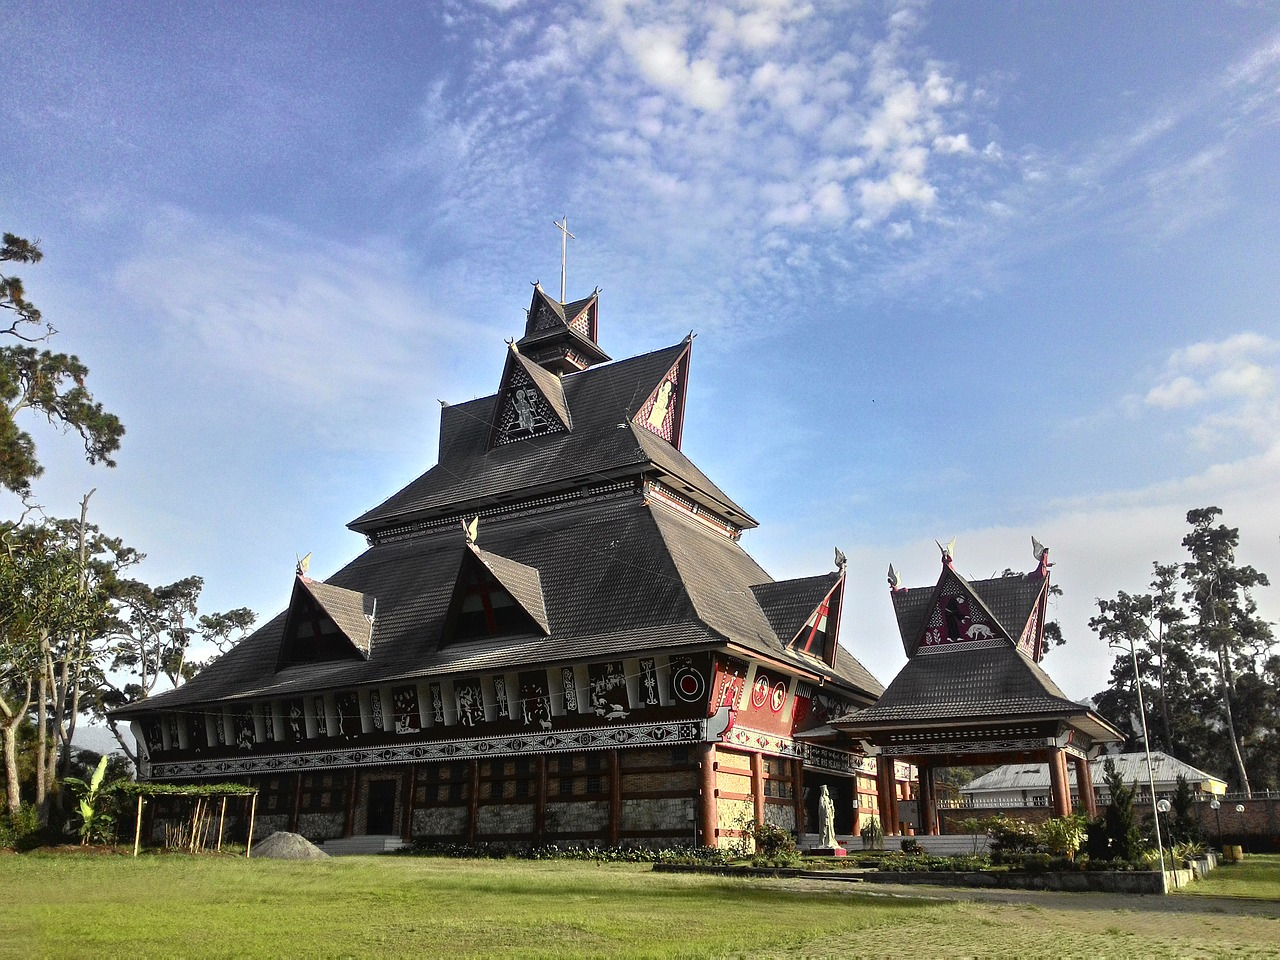 north-sumatra-912871_1280